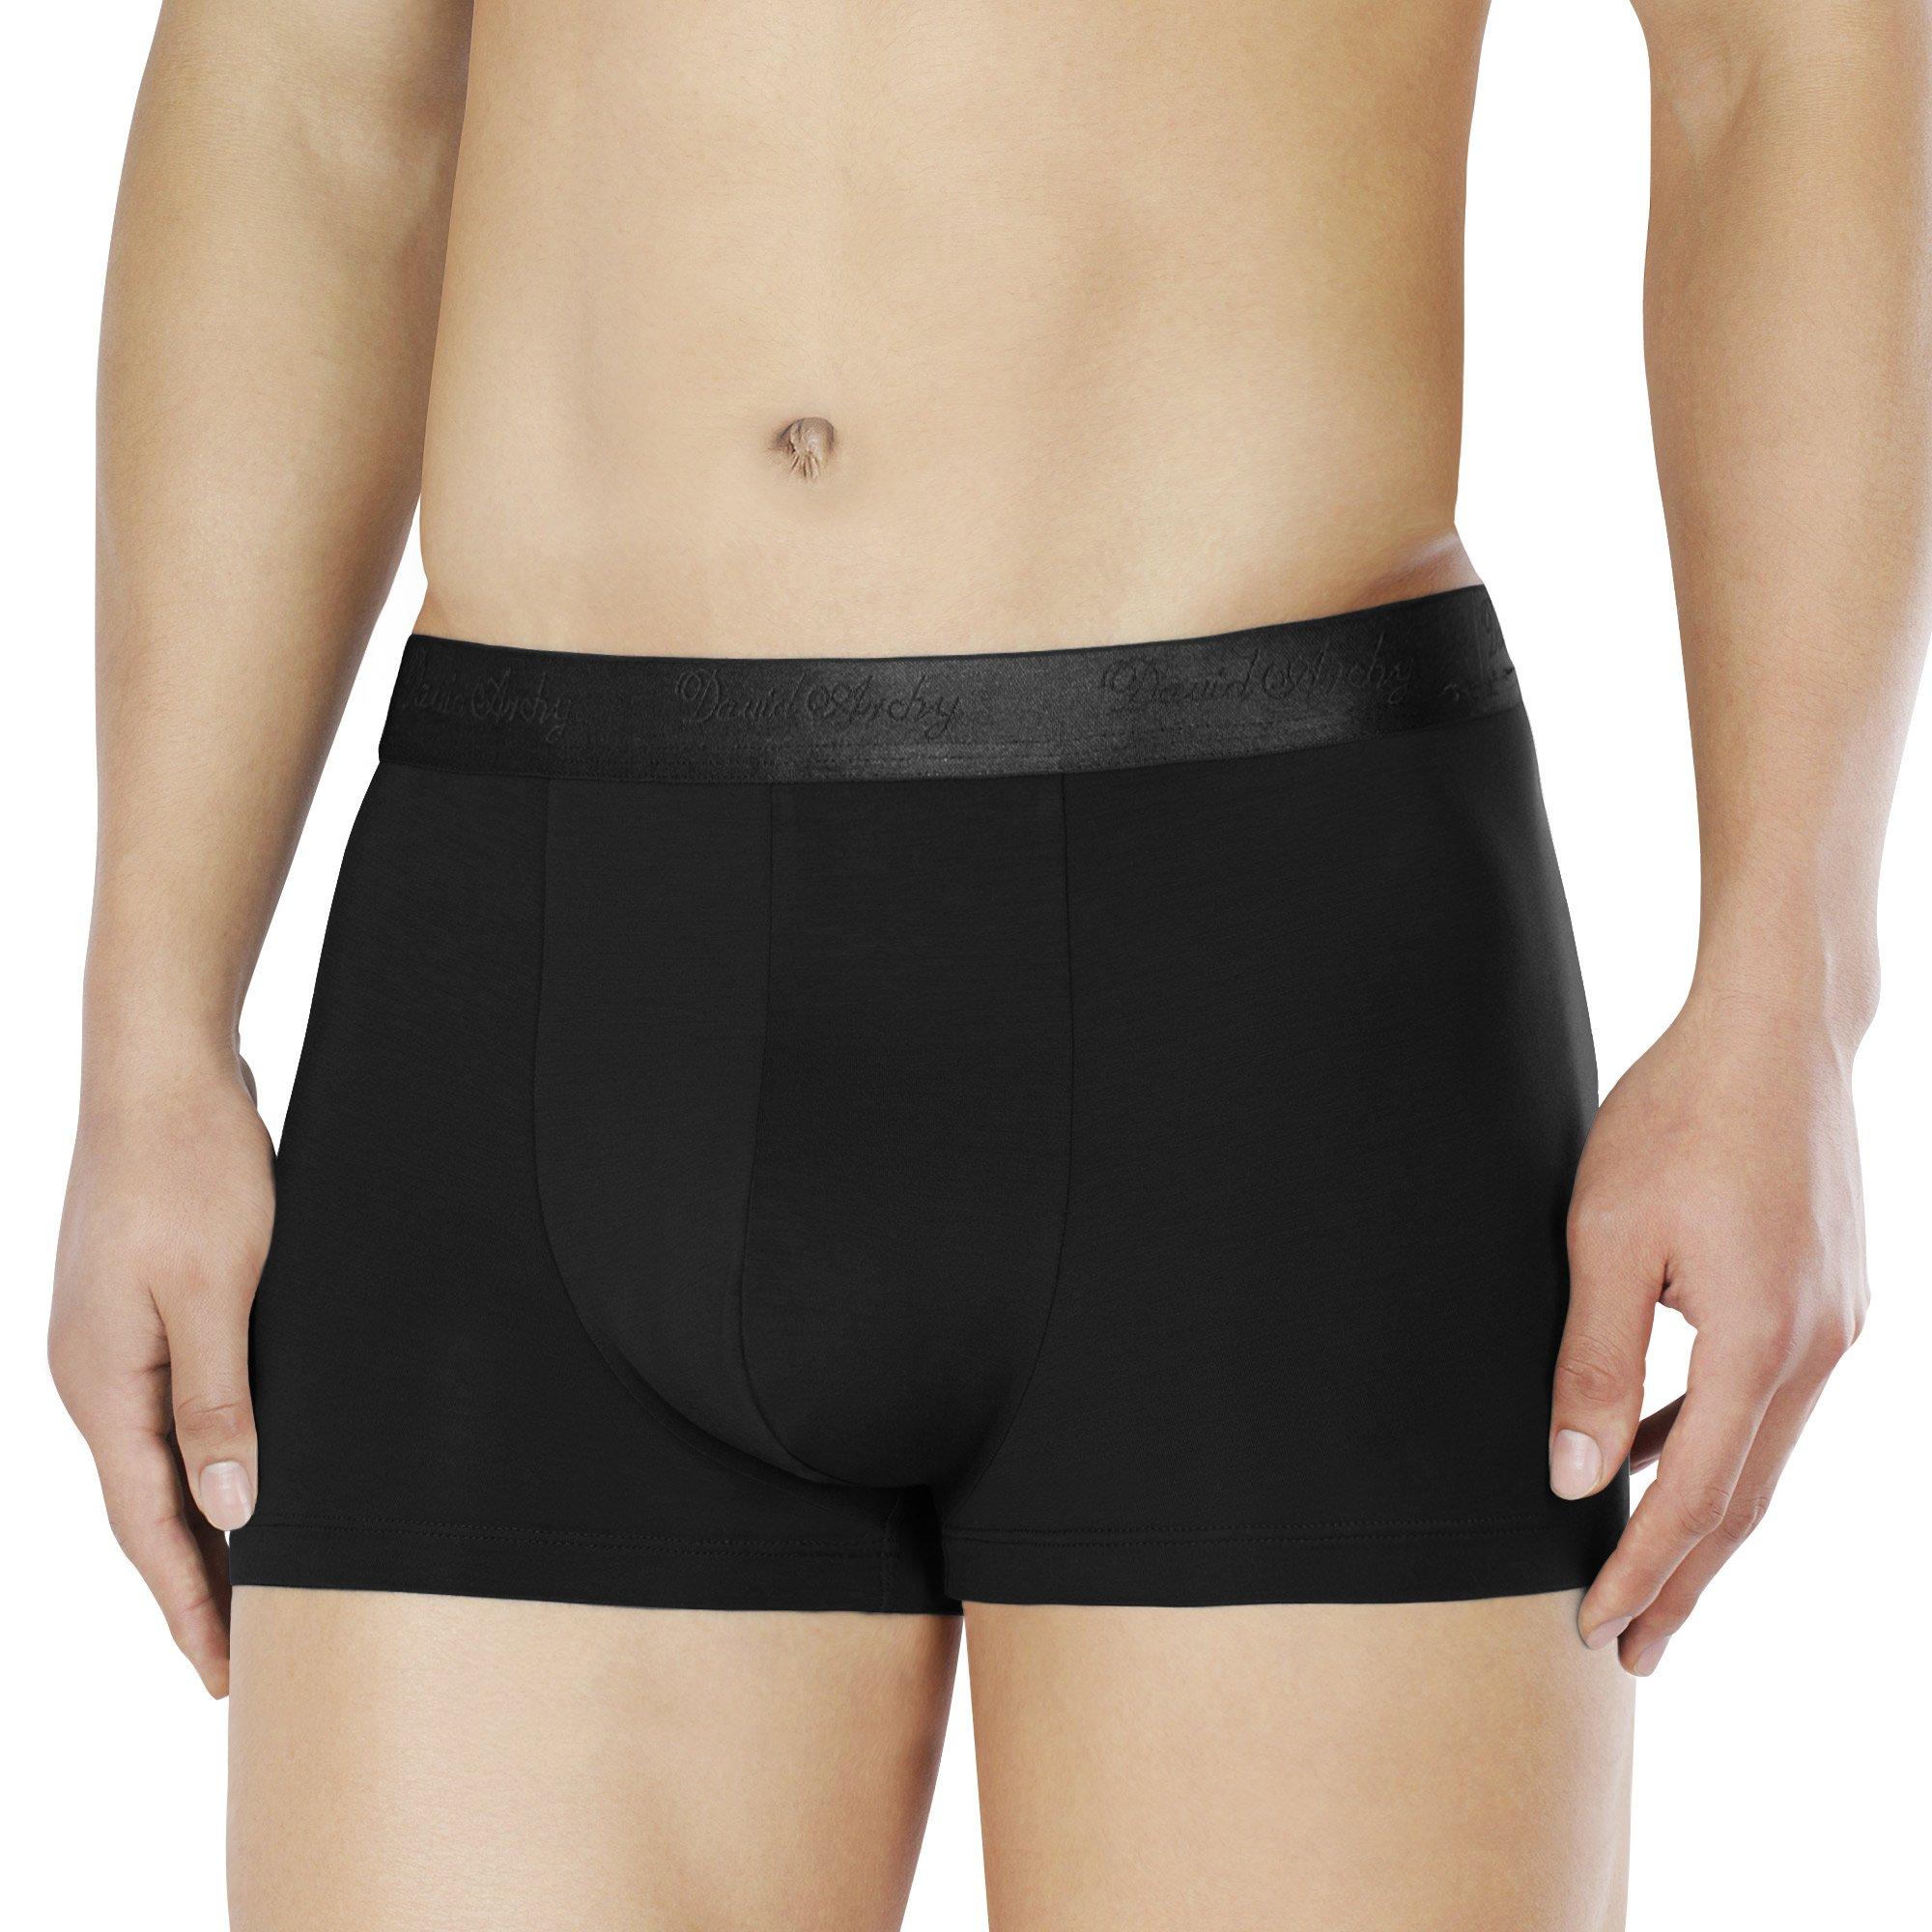 DAVID ARCHY Men's Underwear Soft Micro Modal Trunks 4 Pack